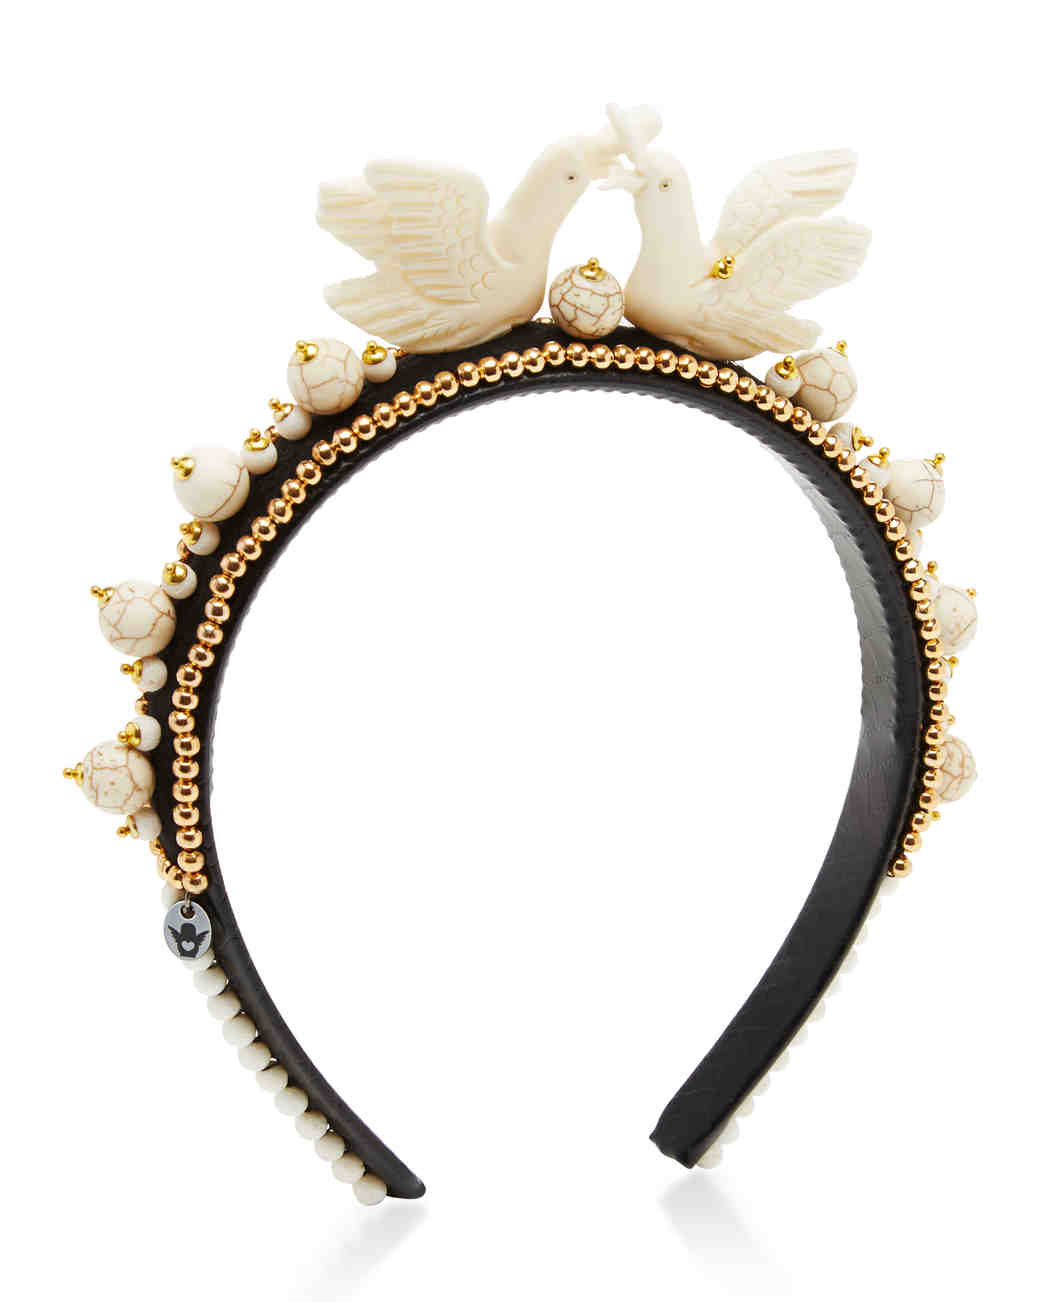 hair-accessories-masterpeace-swan-headband-1014.jpg